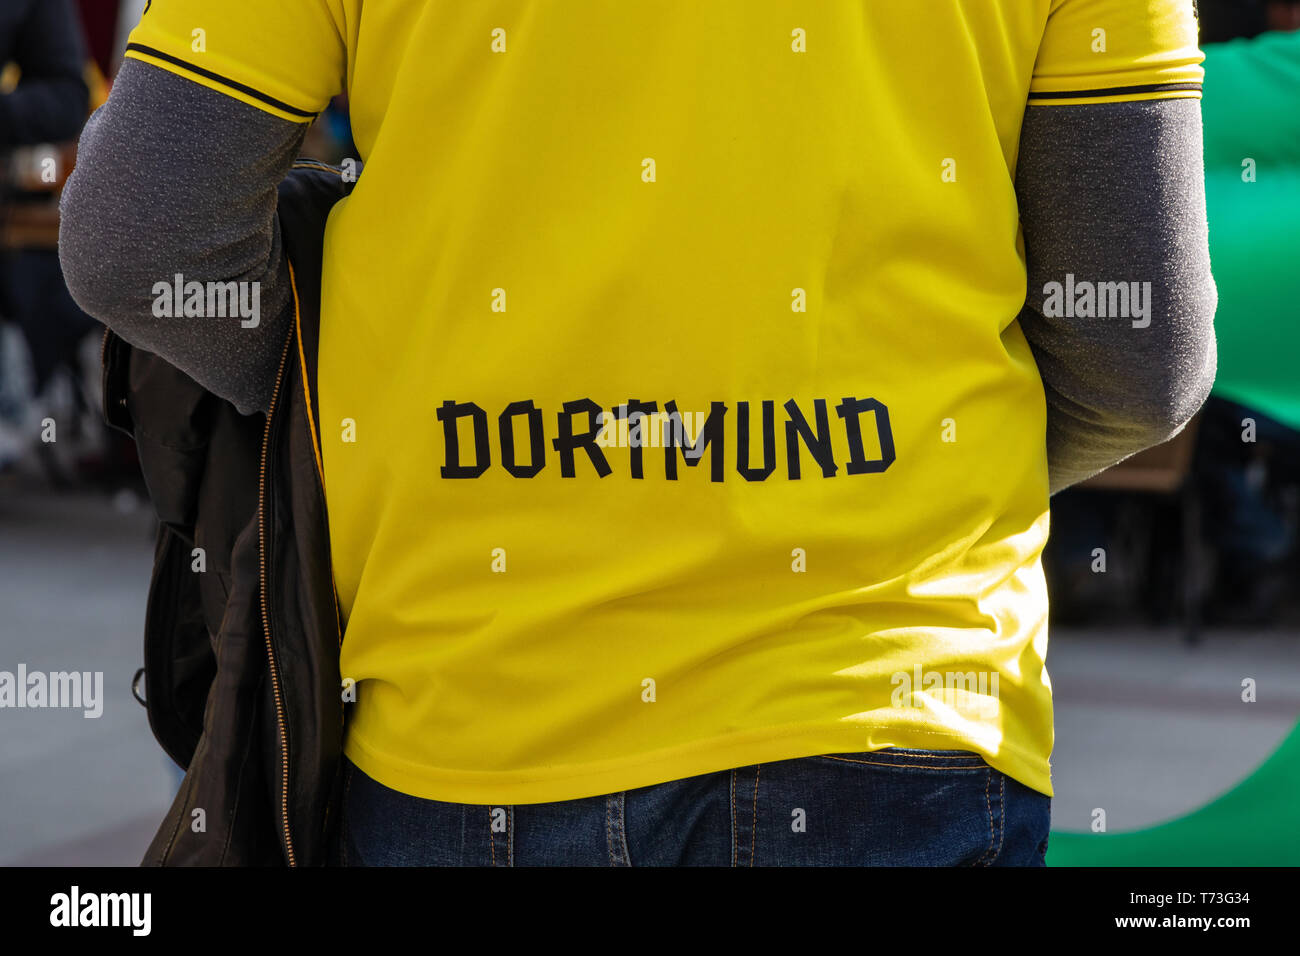 MARIENPLATZ, MUENCHEN, APRIL 6, 2019: shirt of a borussia dortman fan with the logo of the team - Stock Image